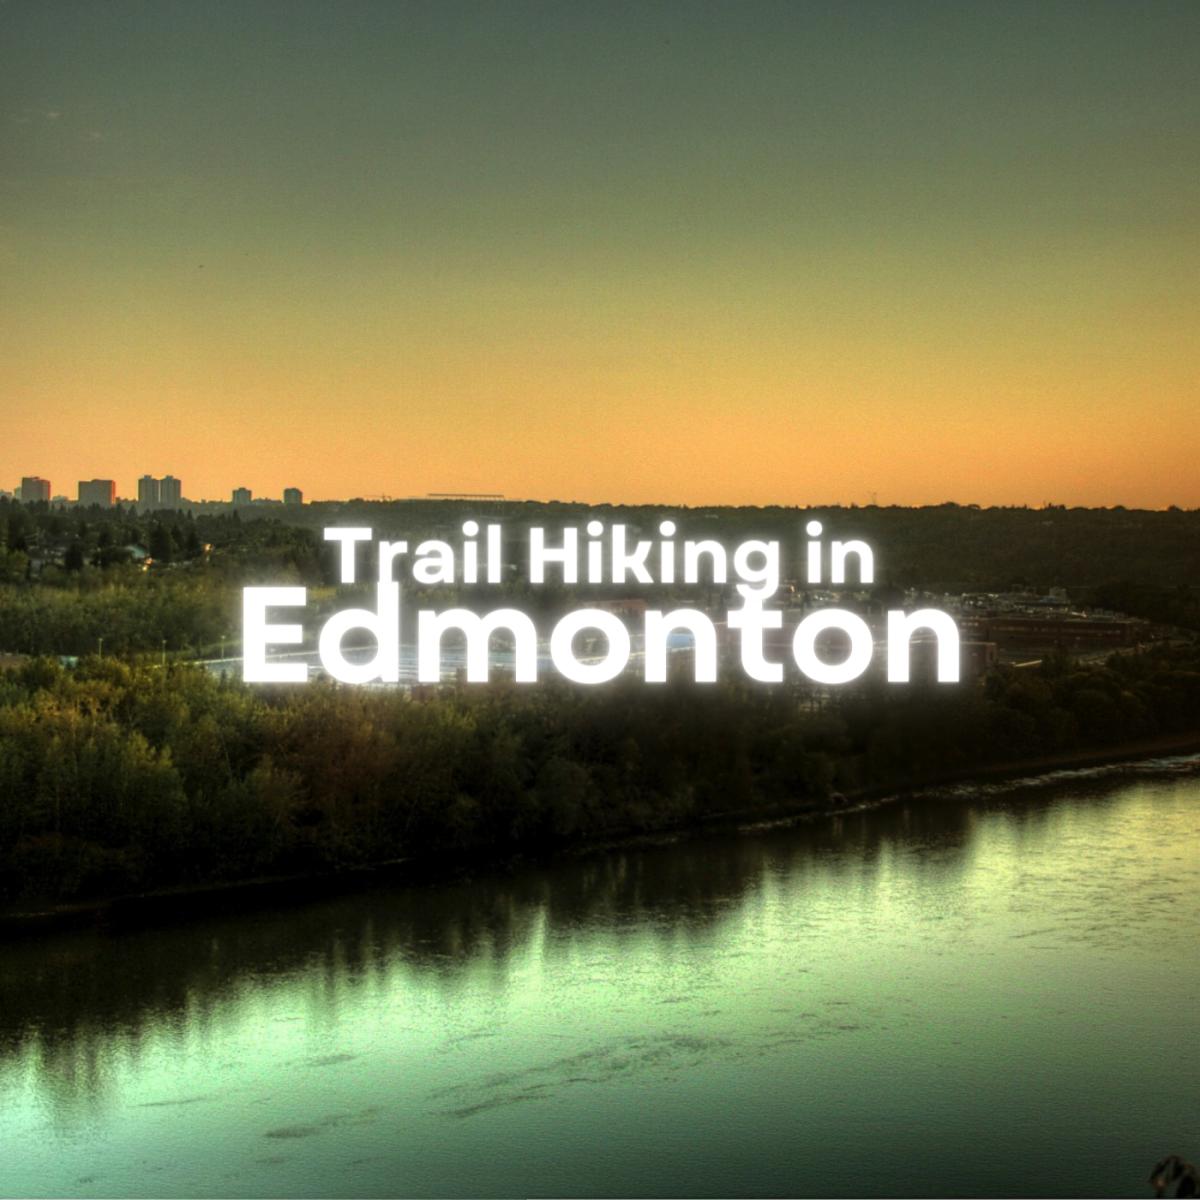 Trail Hiking in Edmonton, Alberta